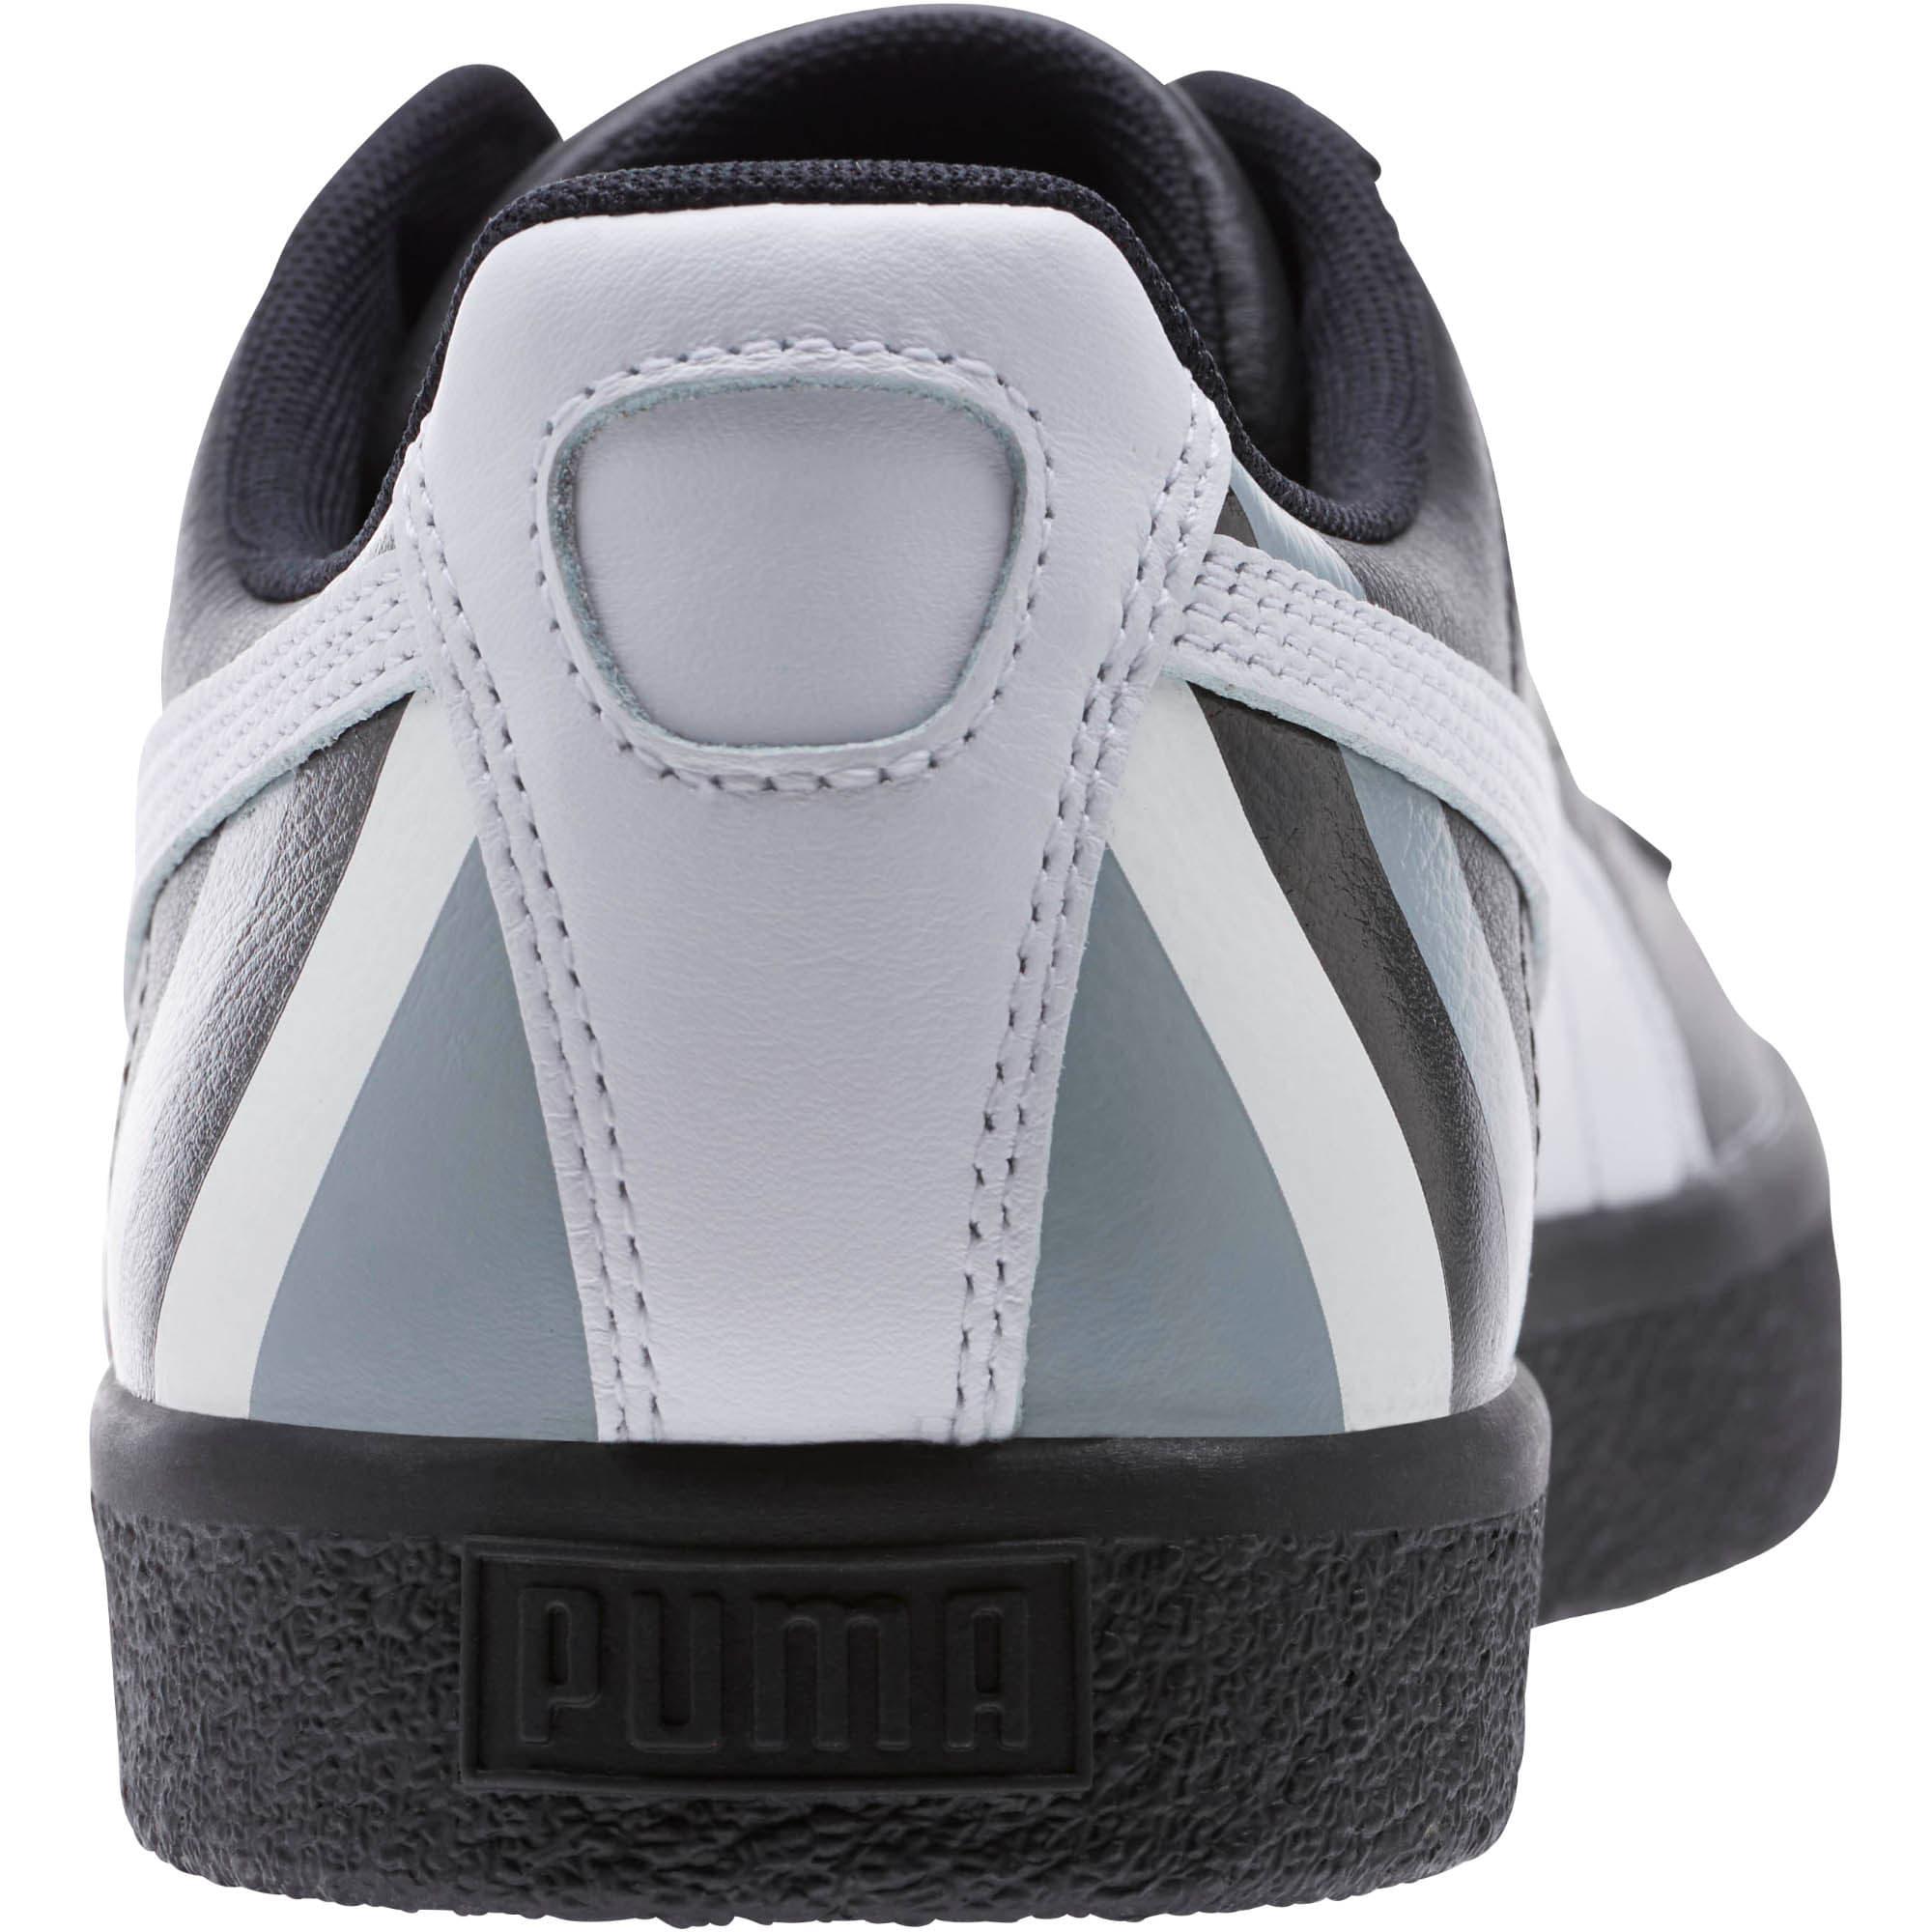 Thumbnail 4 of Clyde Stripes Men's Sneakers, Puma Black-Puma White, medium